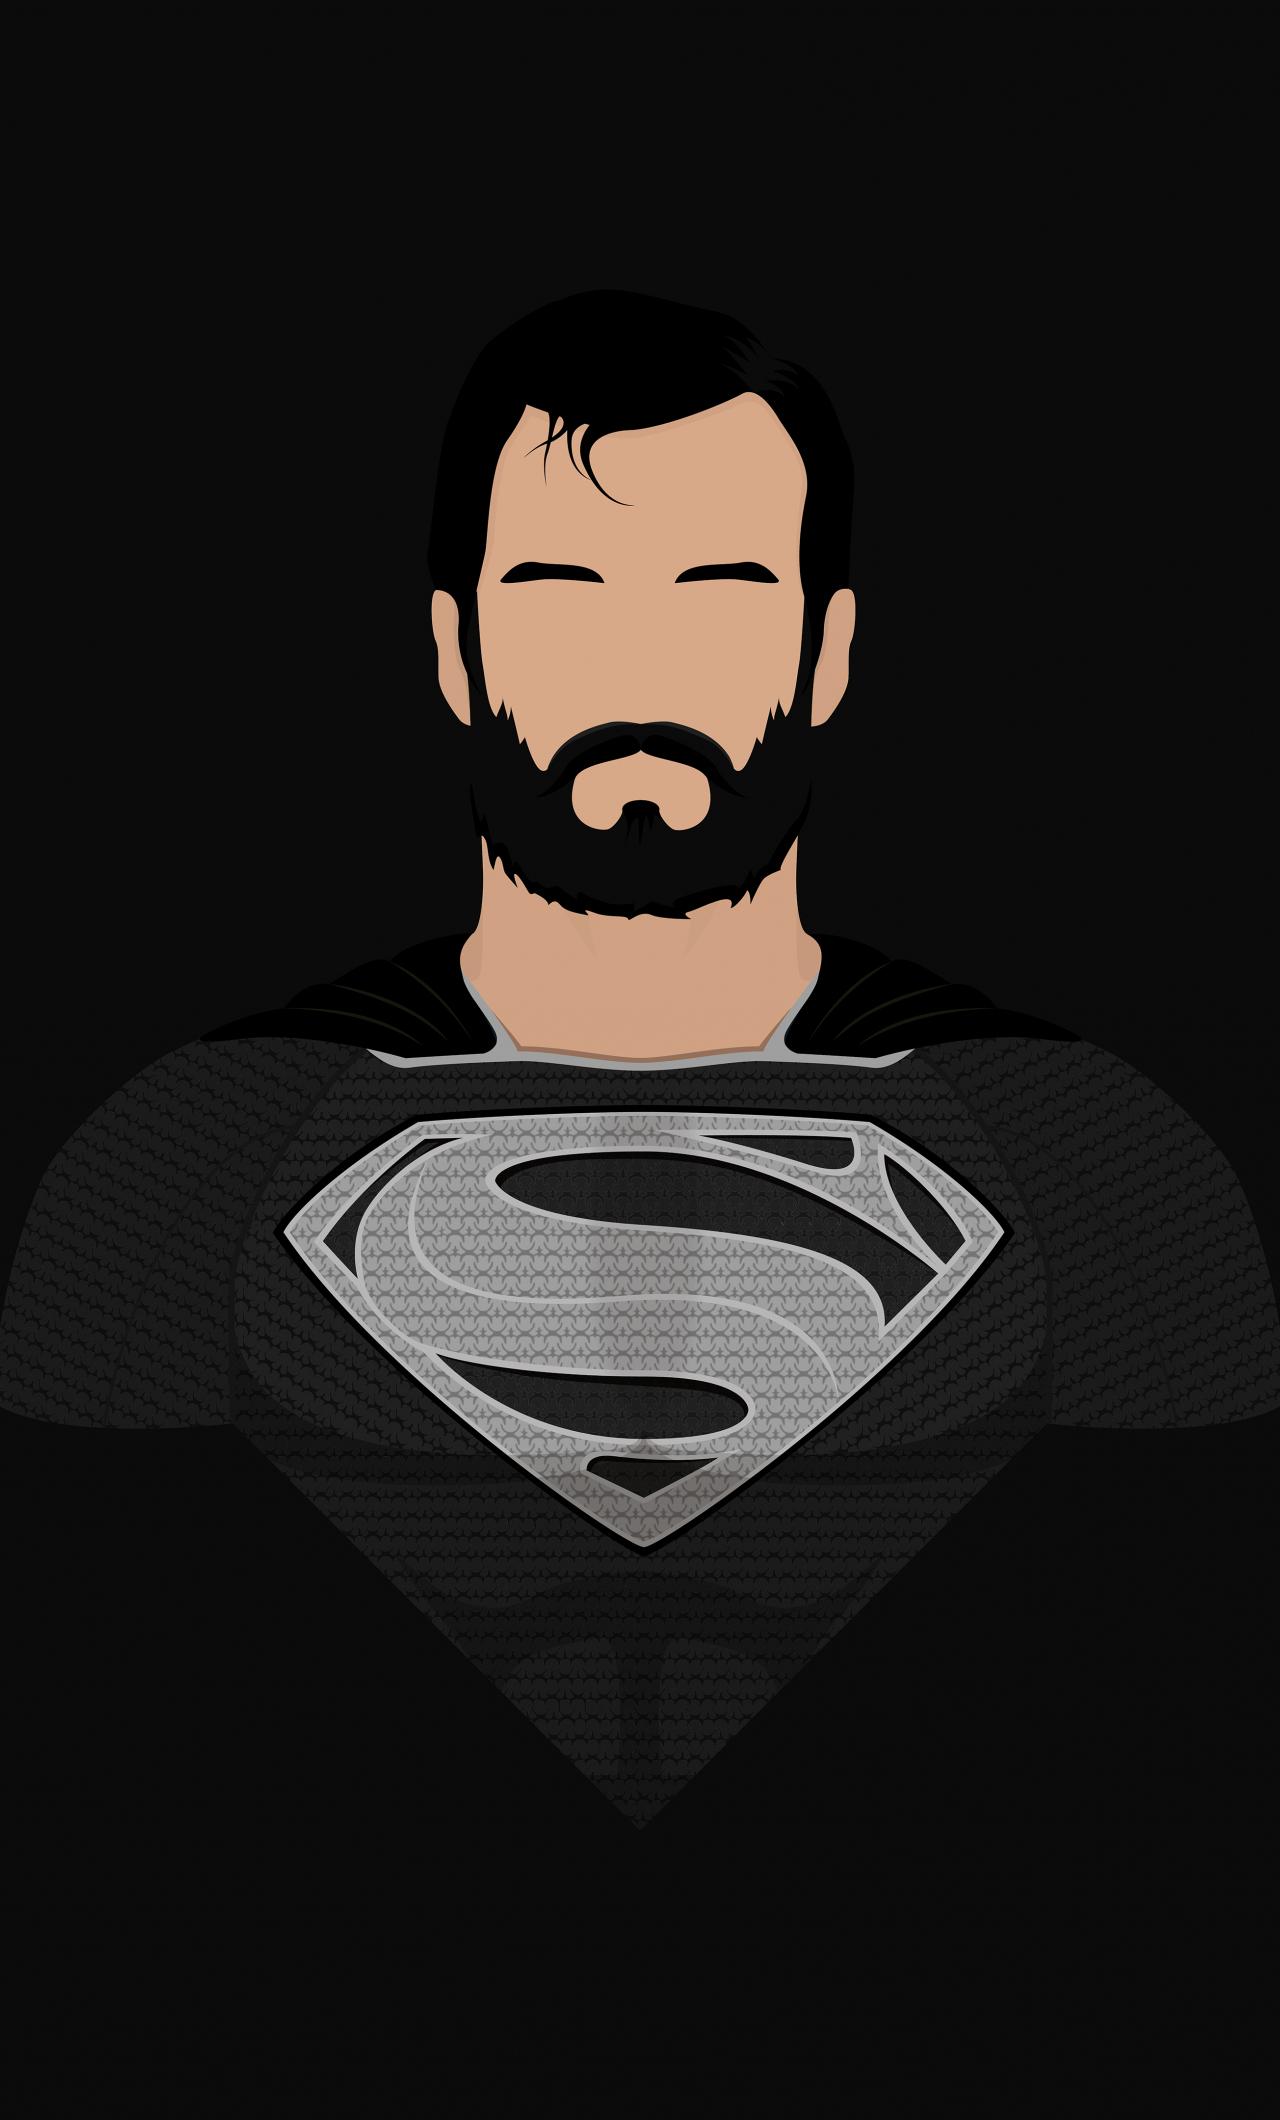 Superman Minimalism Superhero Art 1280x2120 Wallpaper